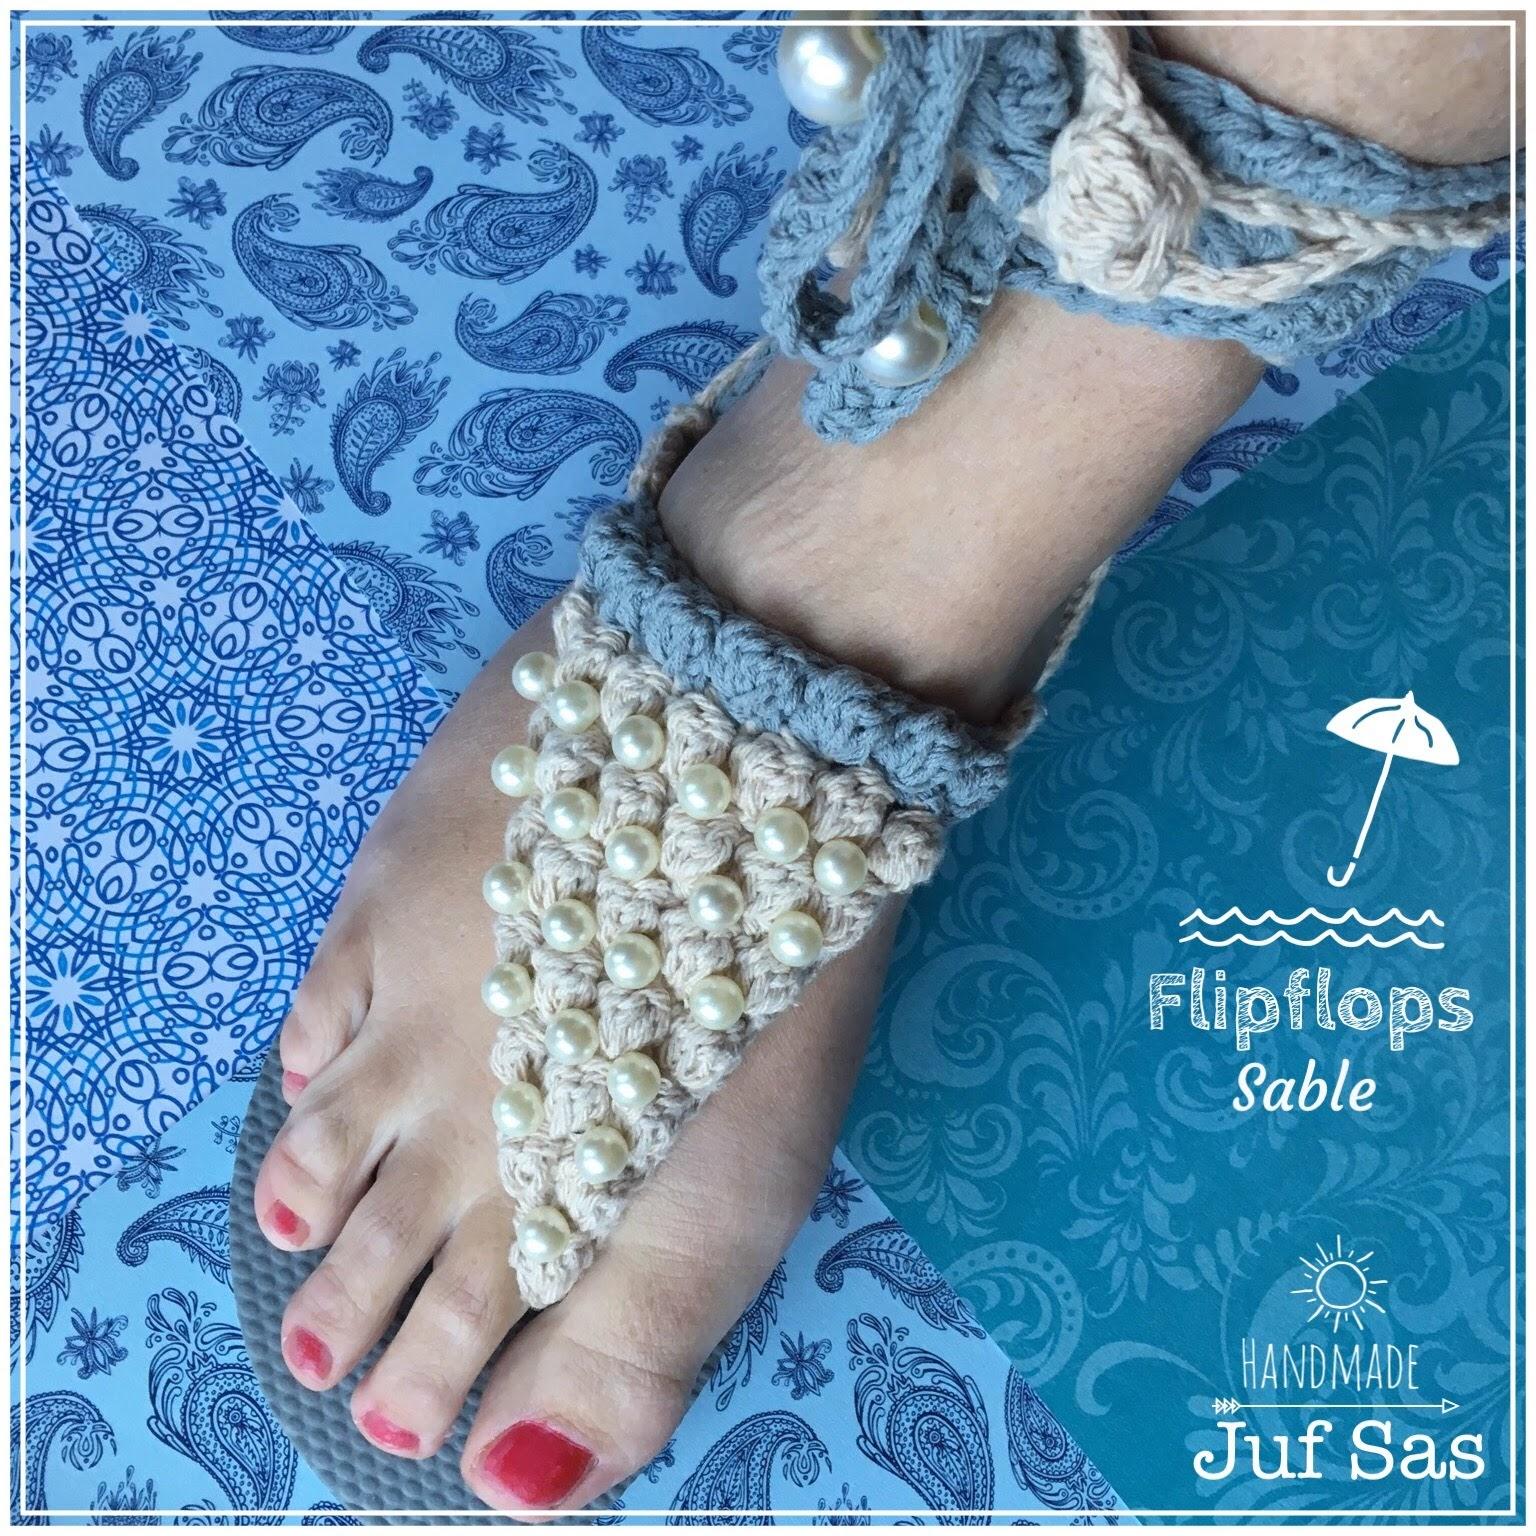 Flipflops Sable